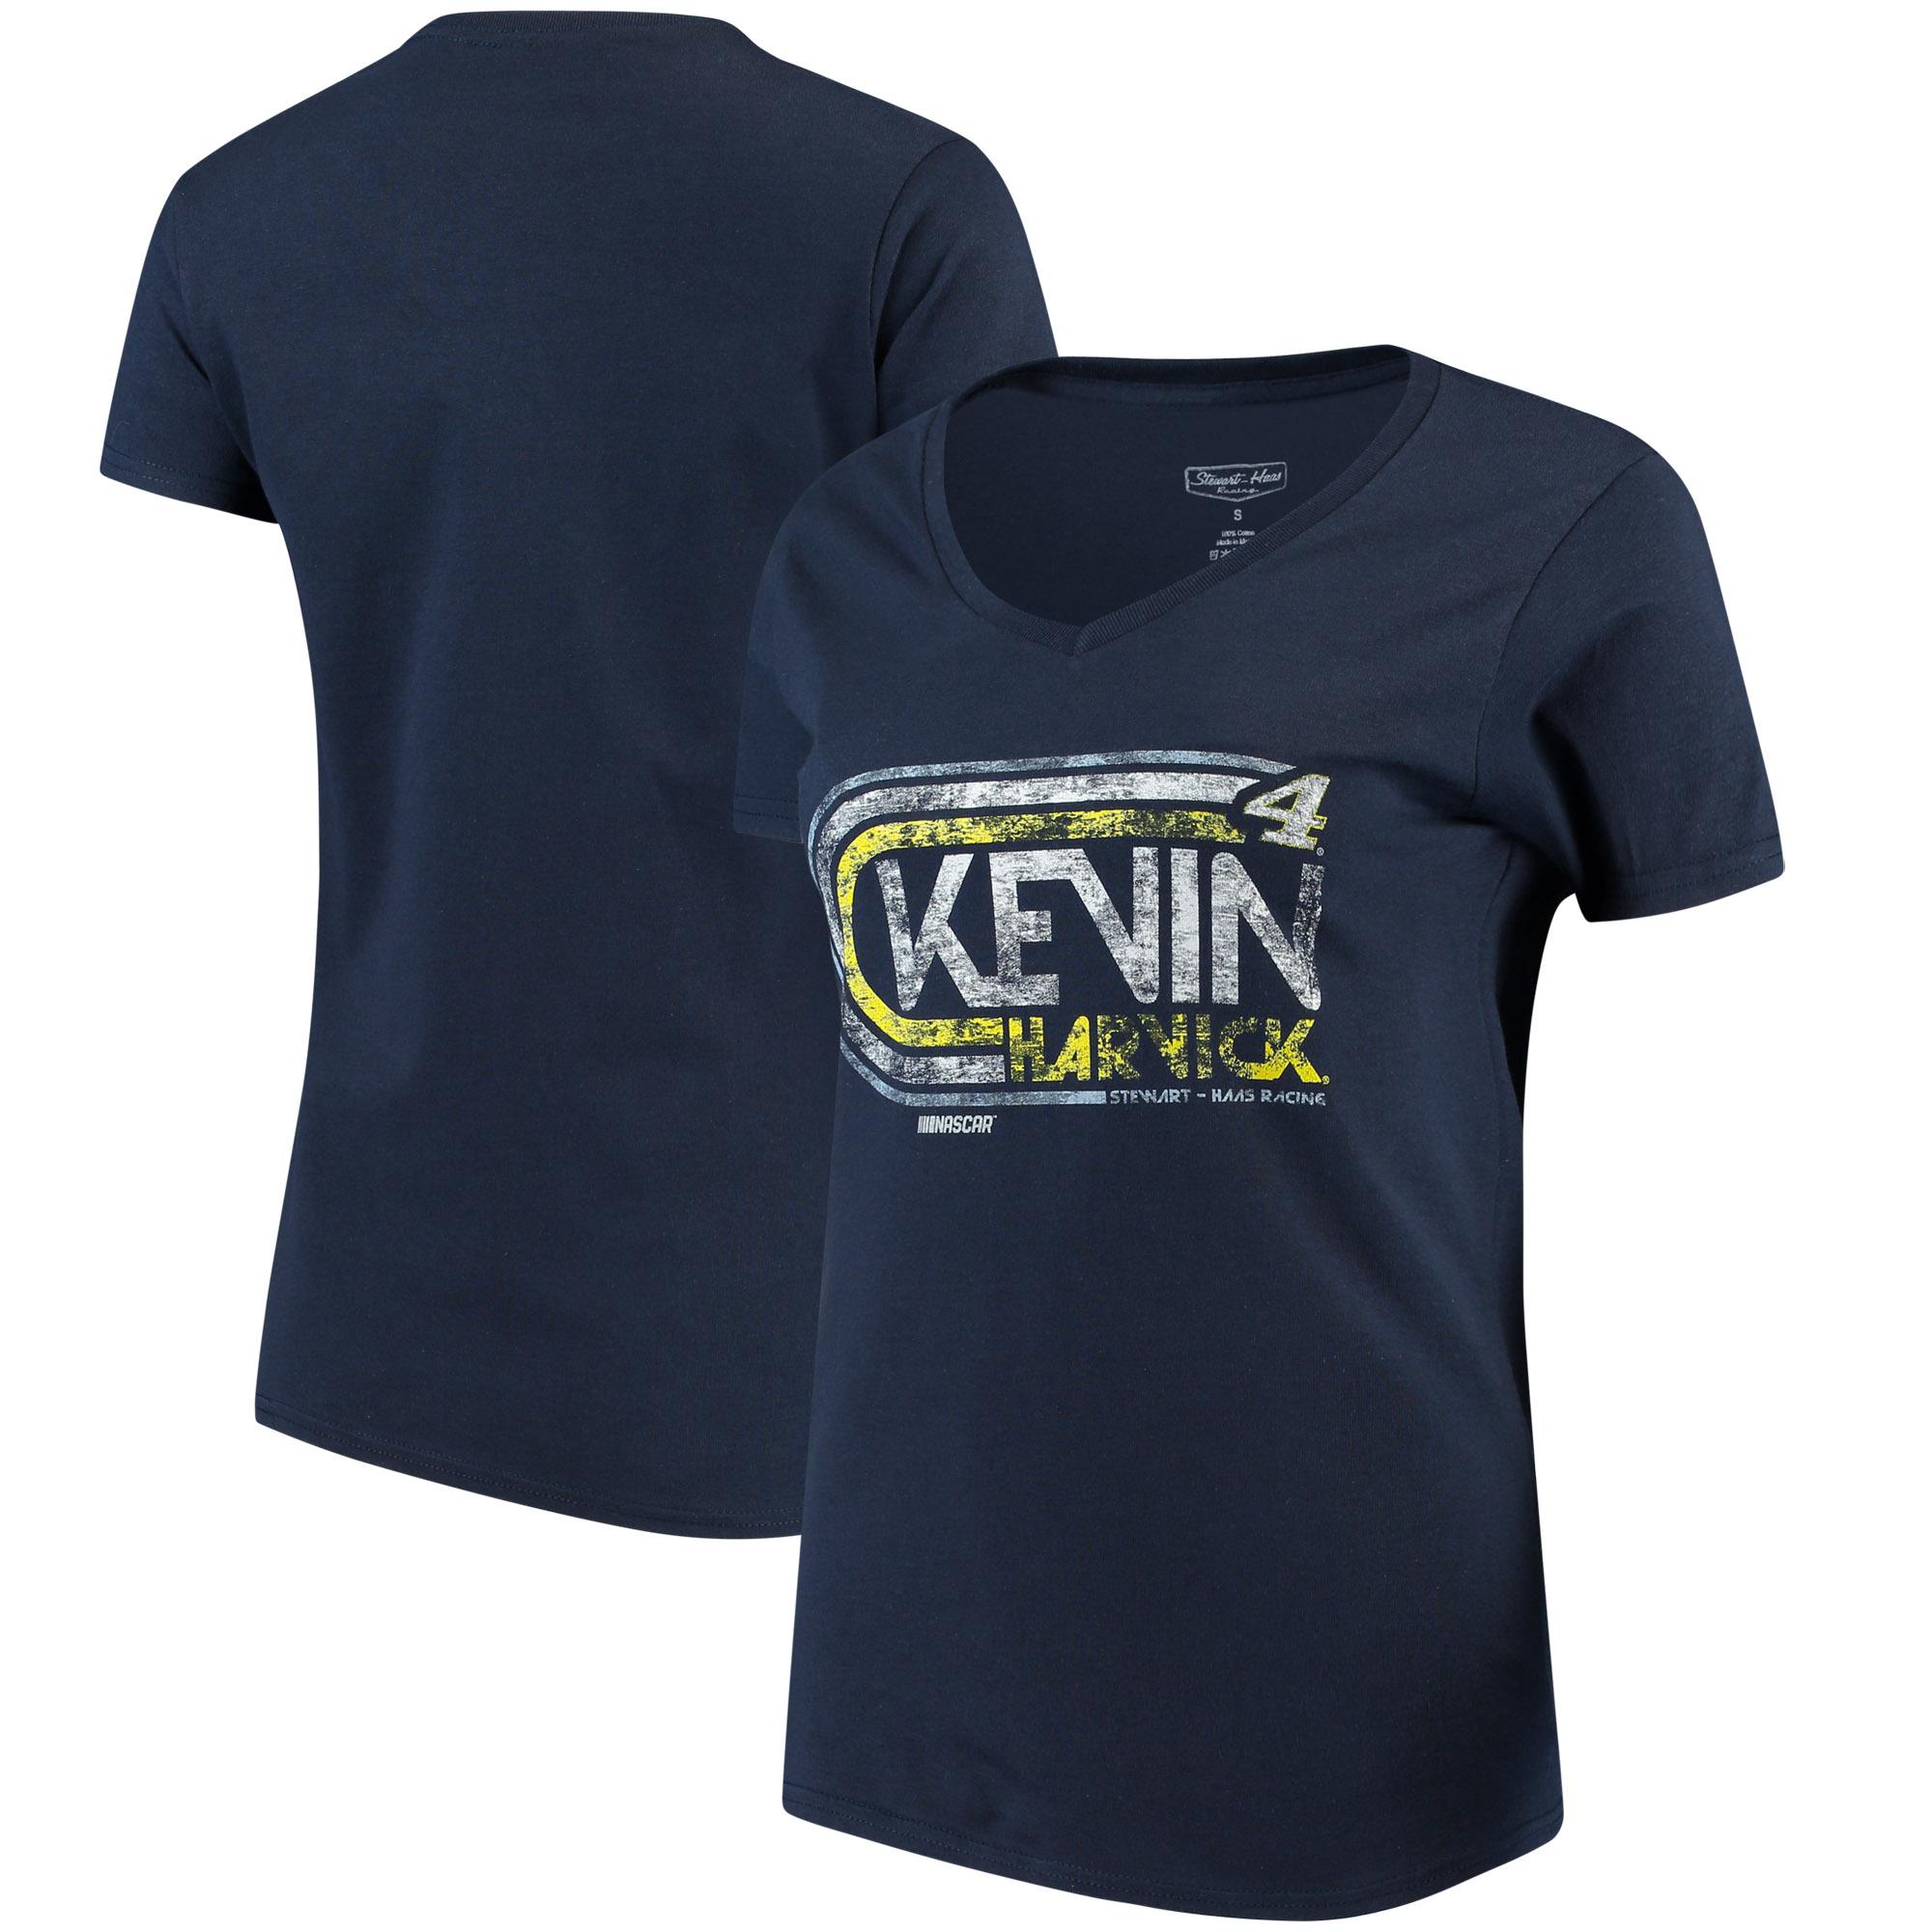 Kevin Harvick Checkered Flag Women's Retro V-Neck T-Shirt - Navy